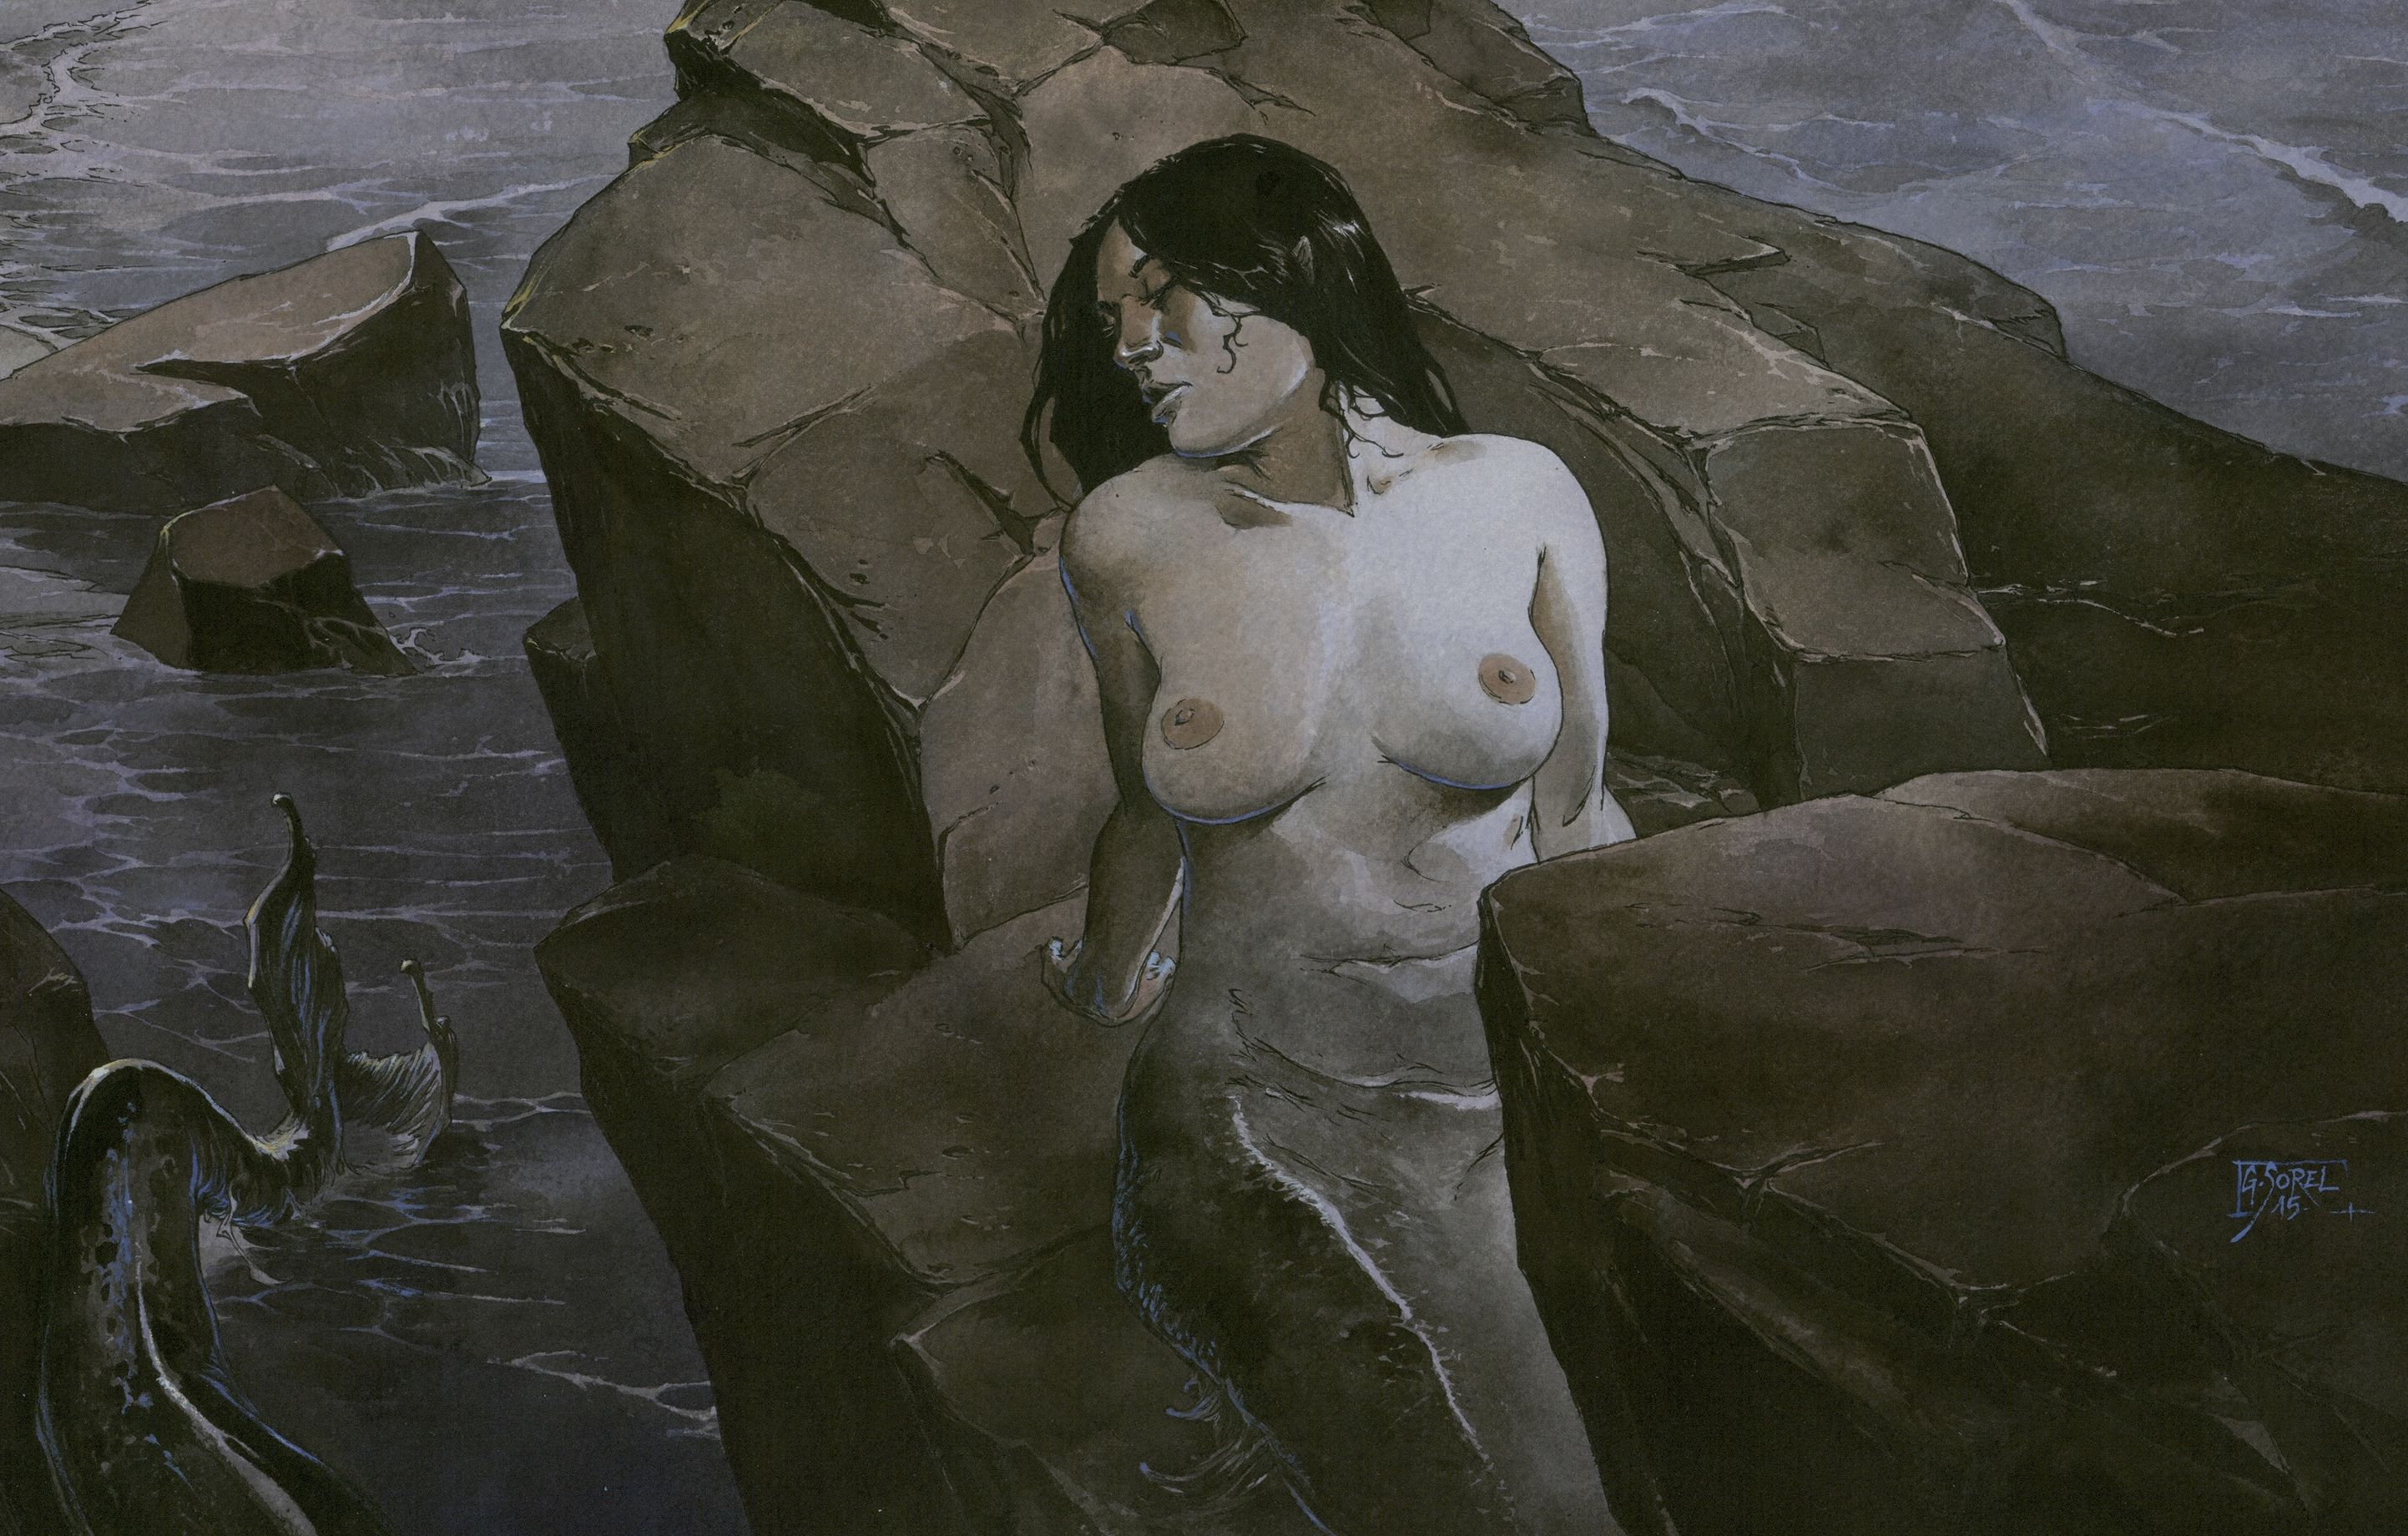 La sirène amoureuse, extrait